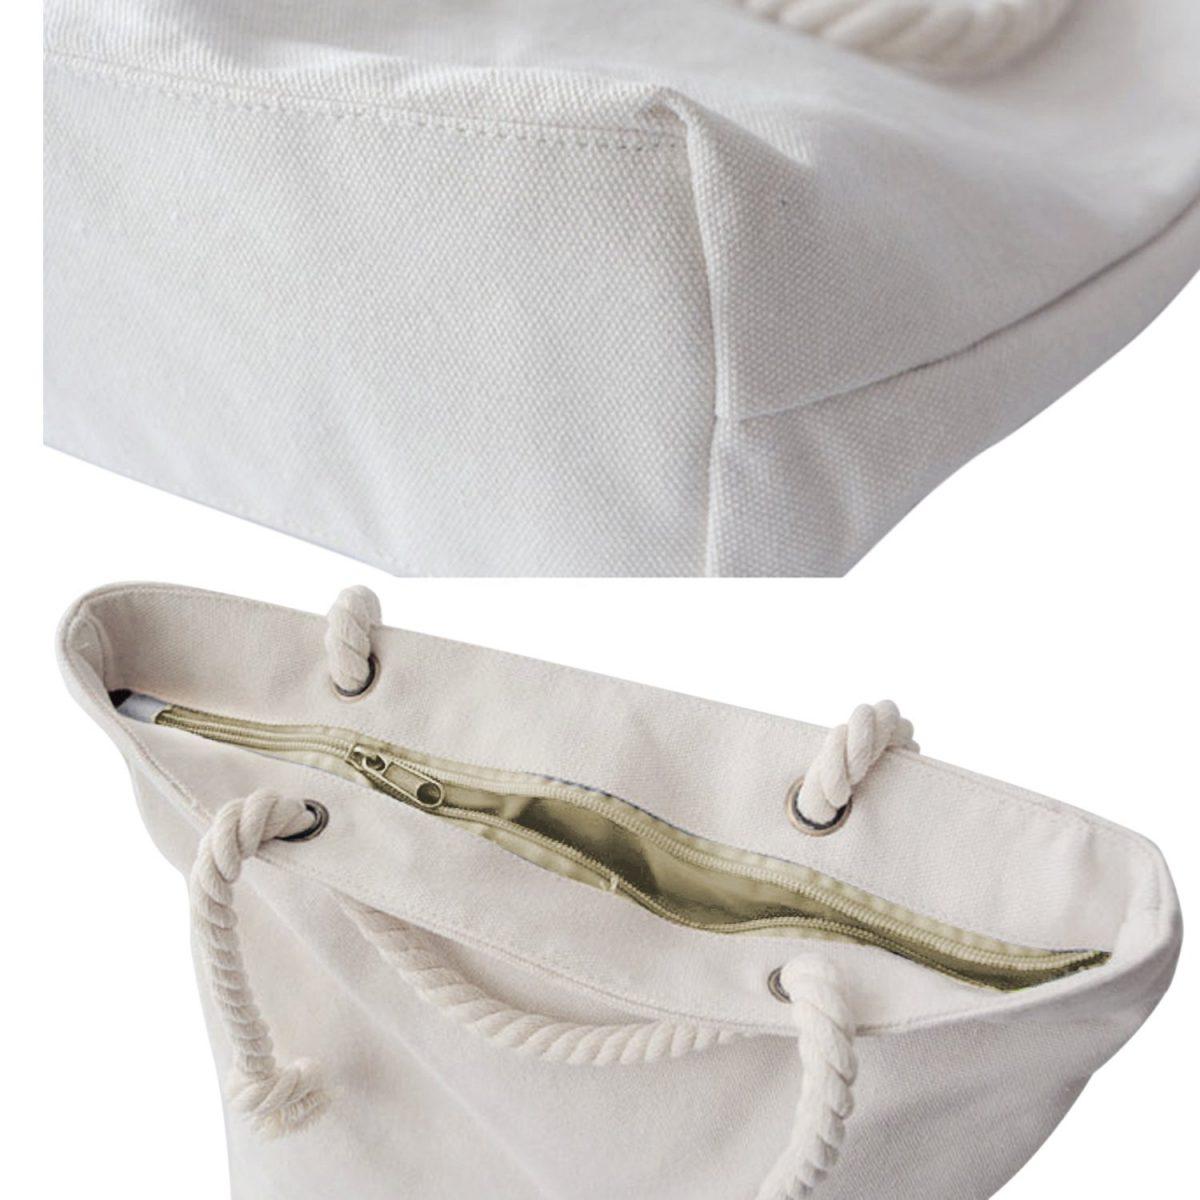 Pop Art Retro Dijital Baskılı Fermuarlı Modern Kumaş Çanta Realhomes